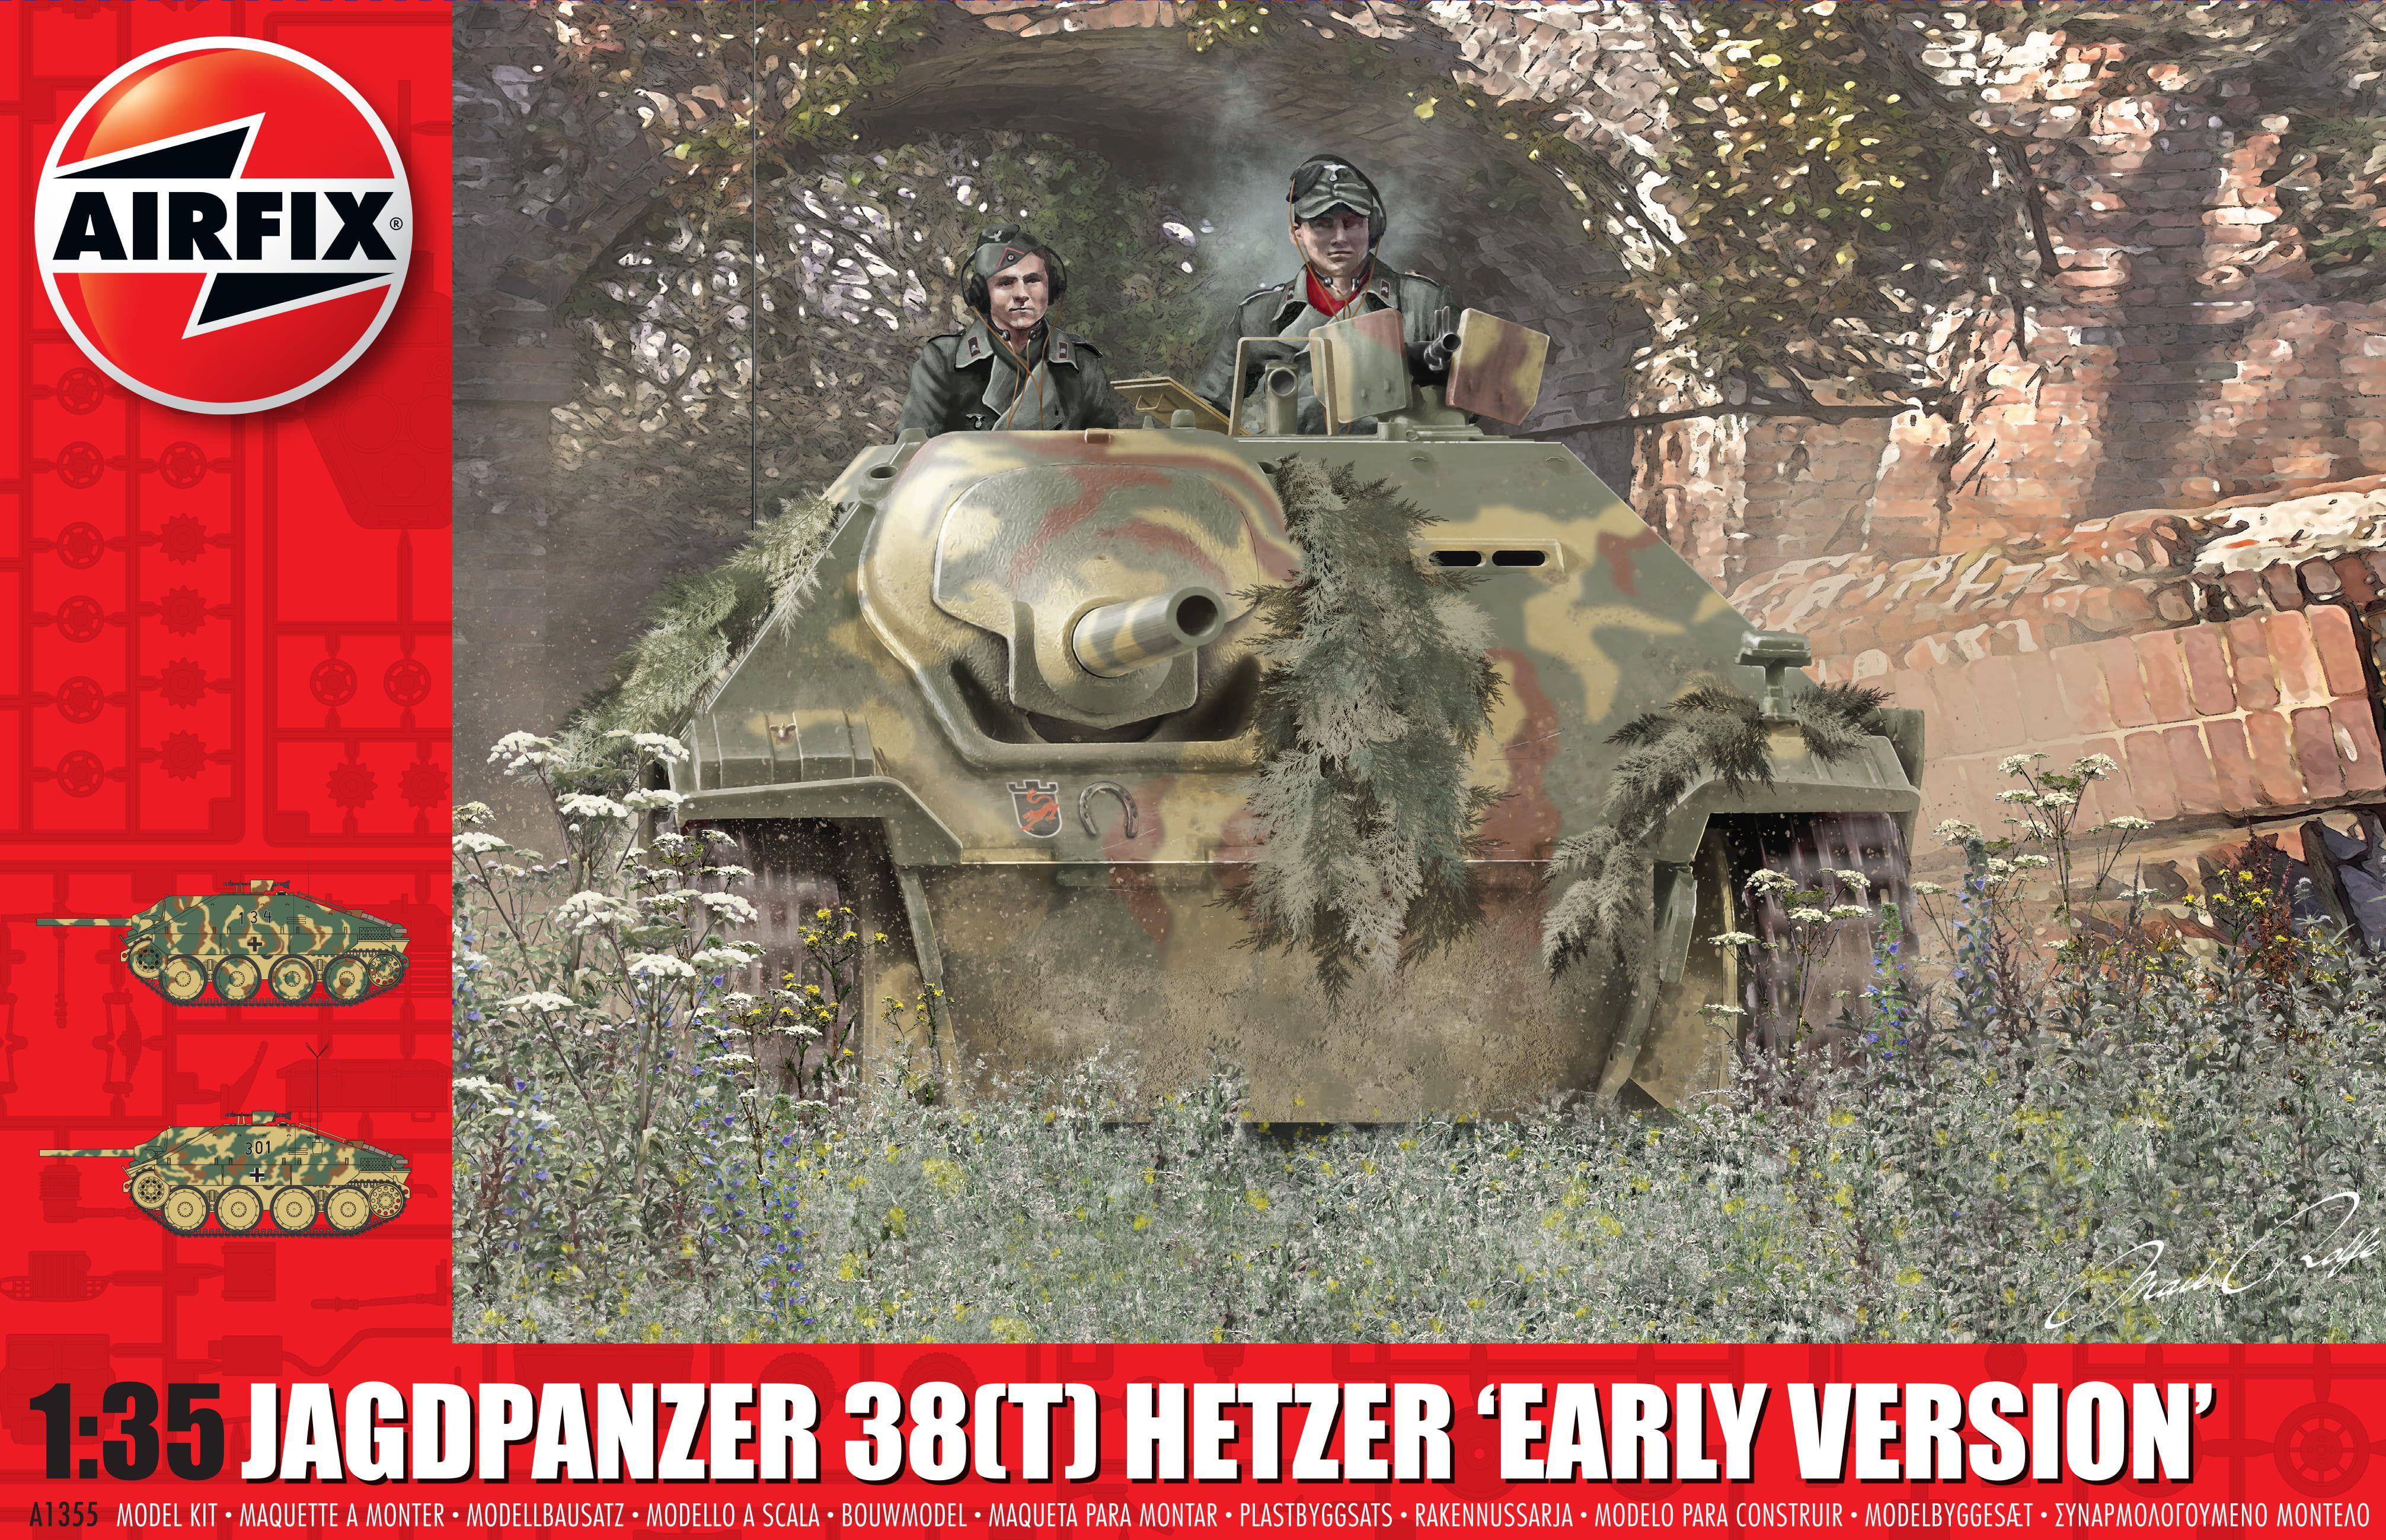 "Airfix JagdPanzer 38 tonne Hetzer ""Early Version""  1:35 Scale Plastic Model Kit"